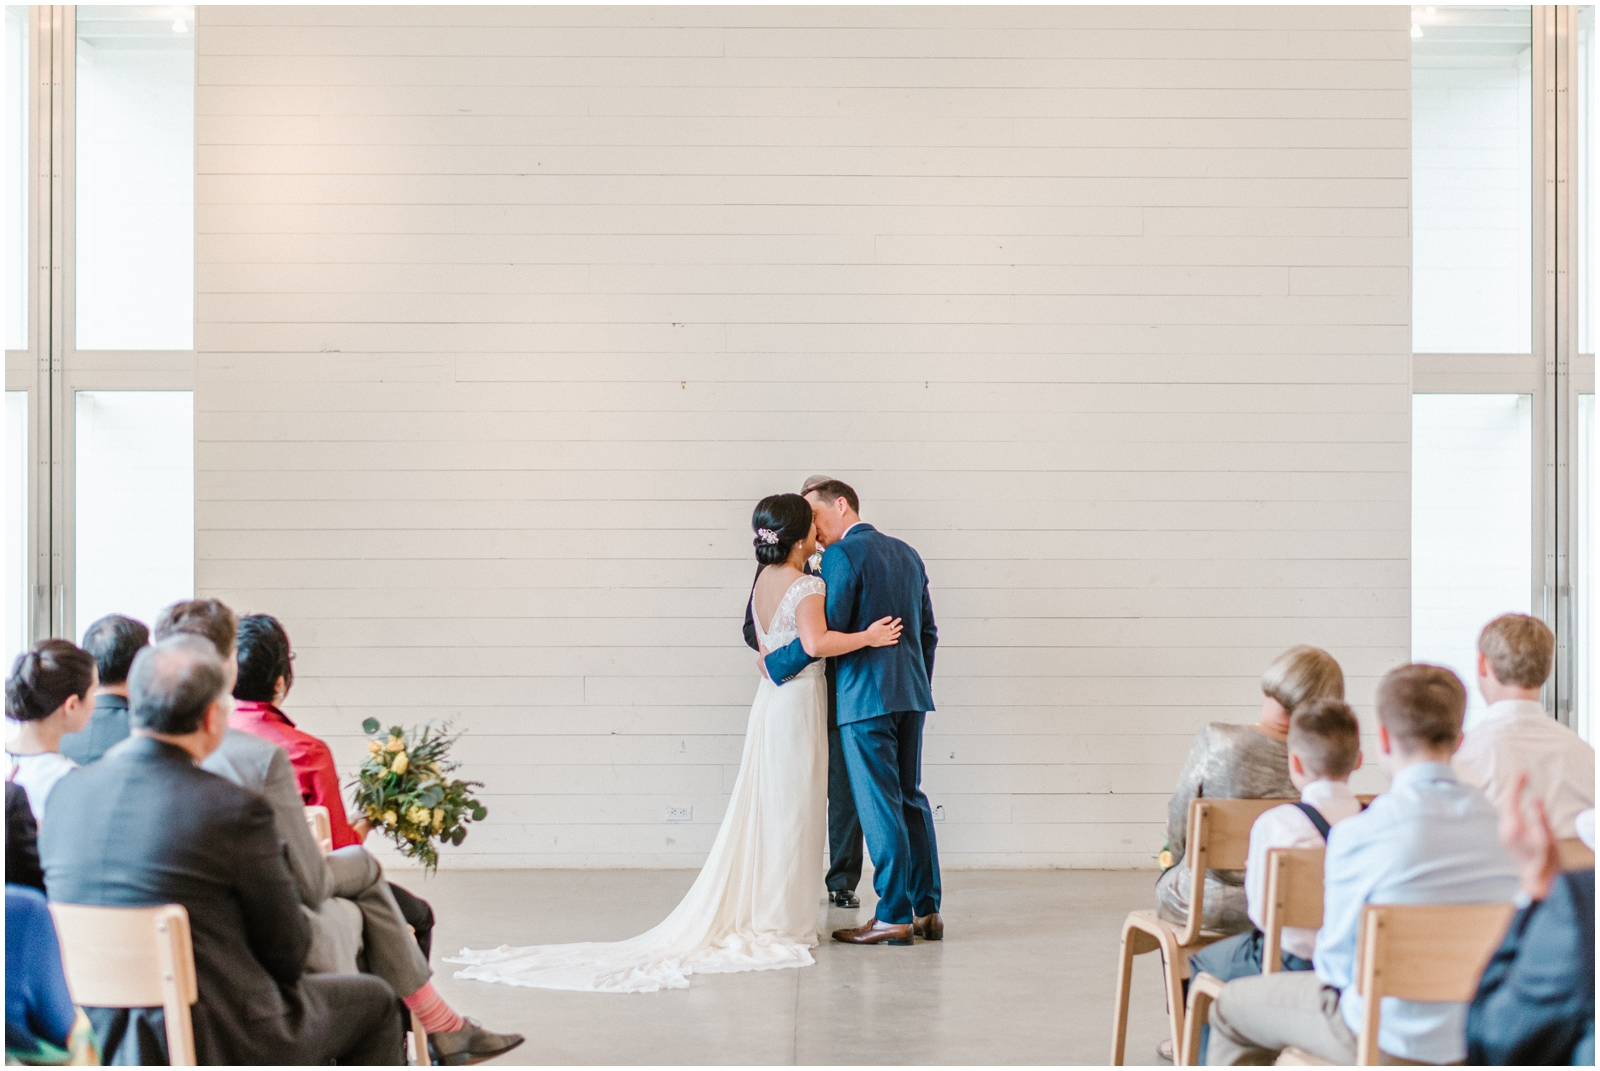 Minimalistic TX Venue Prosper House -Austin Wedding Planner_0344.jpg